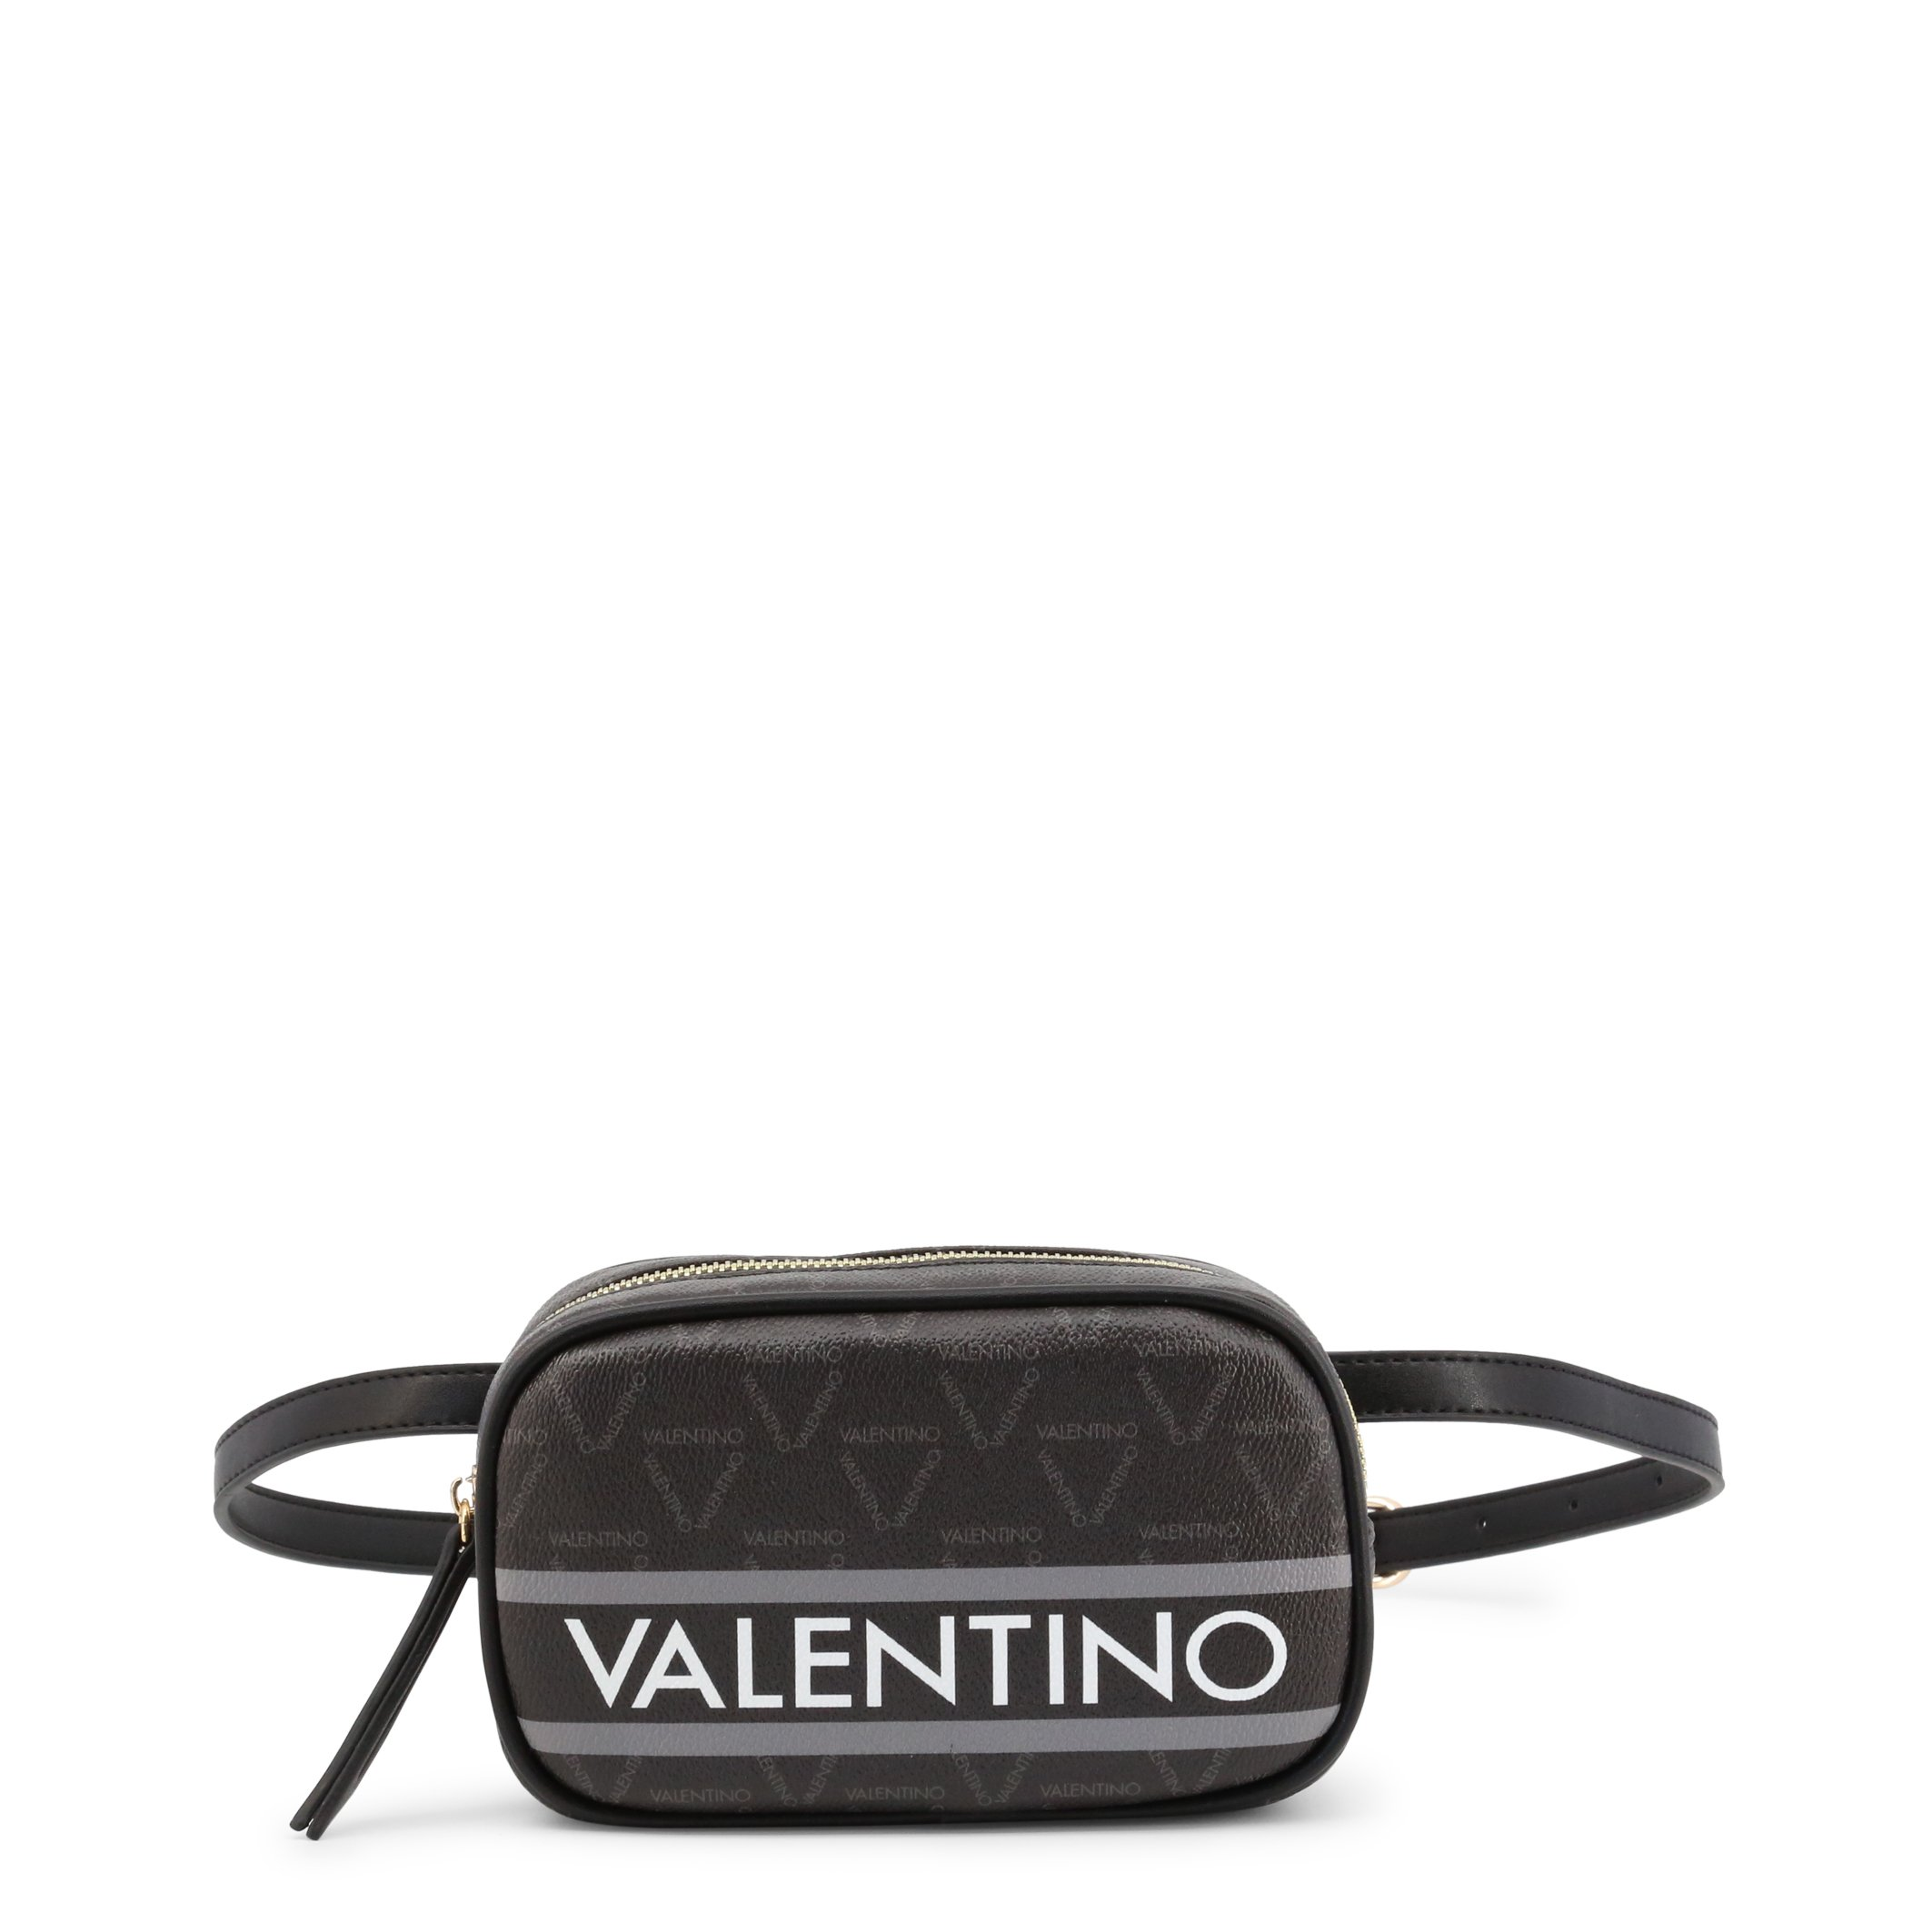 Valentino by Mario Valentino Women's Shoulder Bag Various Colours BABILA-VBS4L304 - black NOSIZE